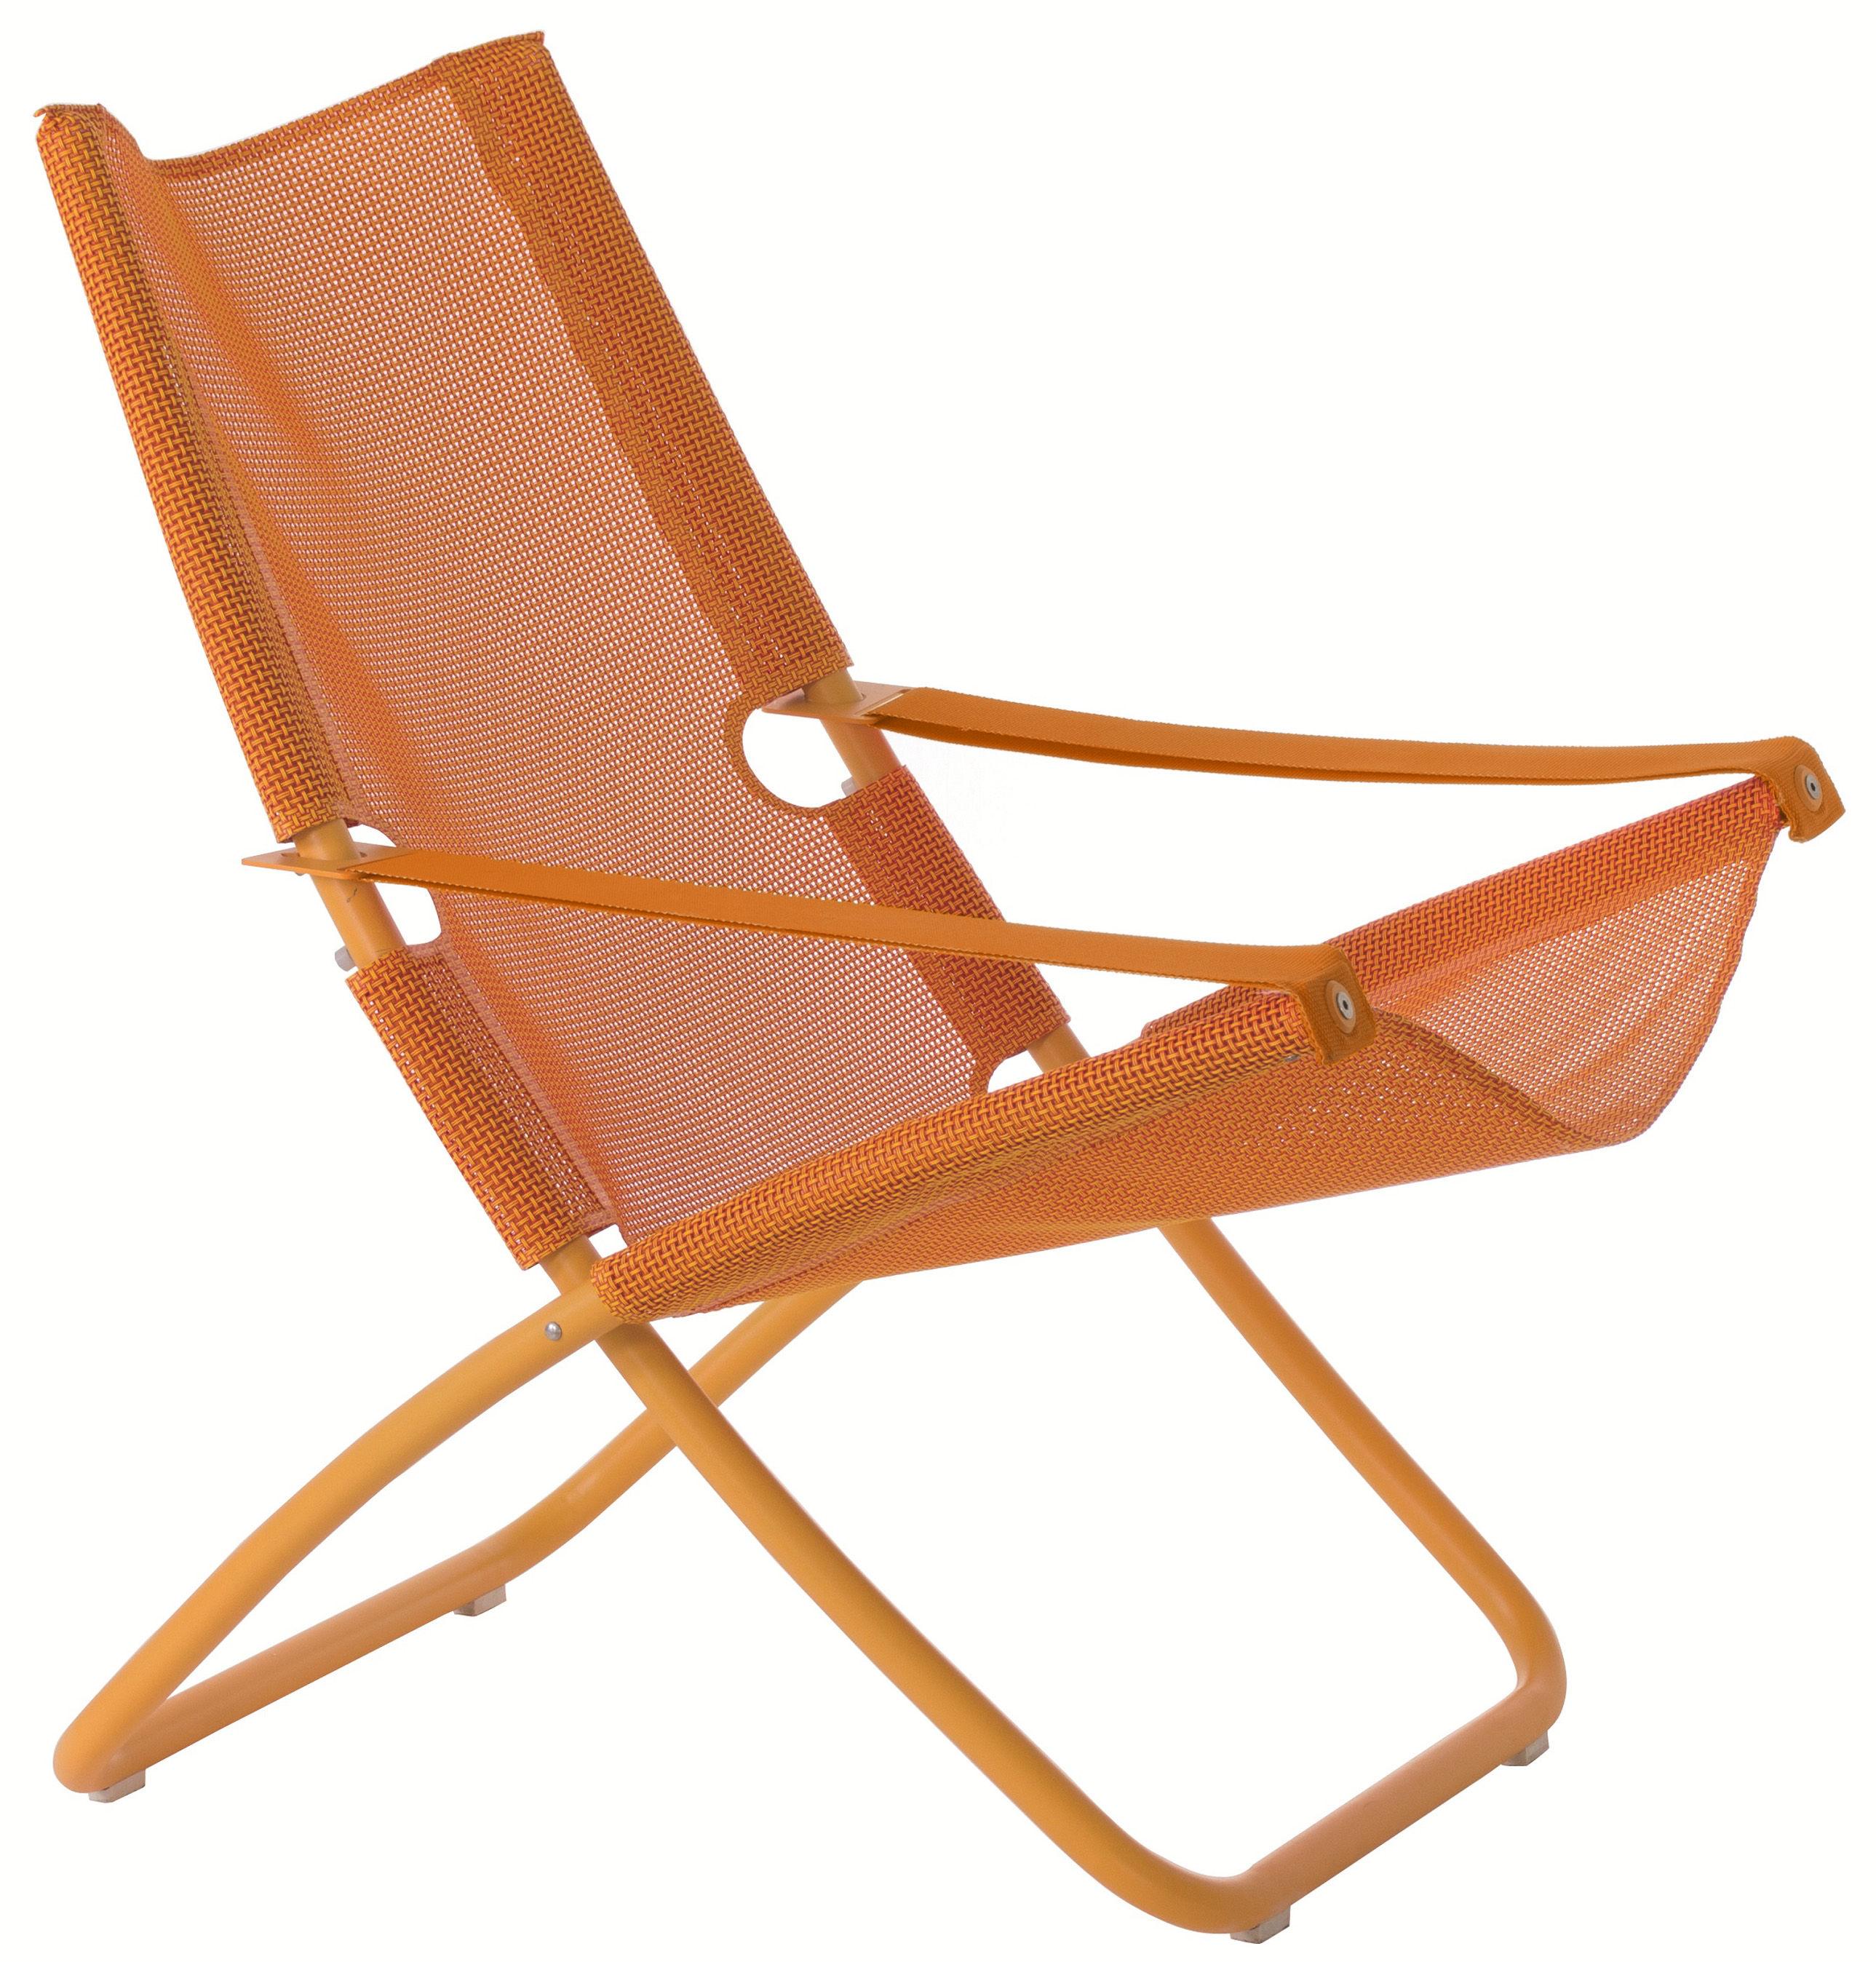 chaise longue snooze pliable 2 positions orange emu. Black Bedroom Furniture Sets. Home Design Ideas